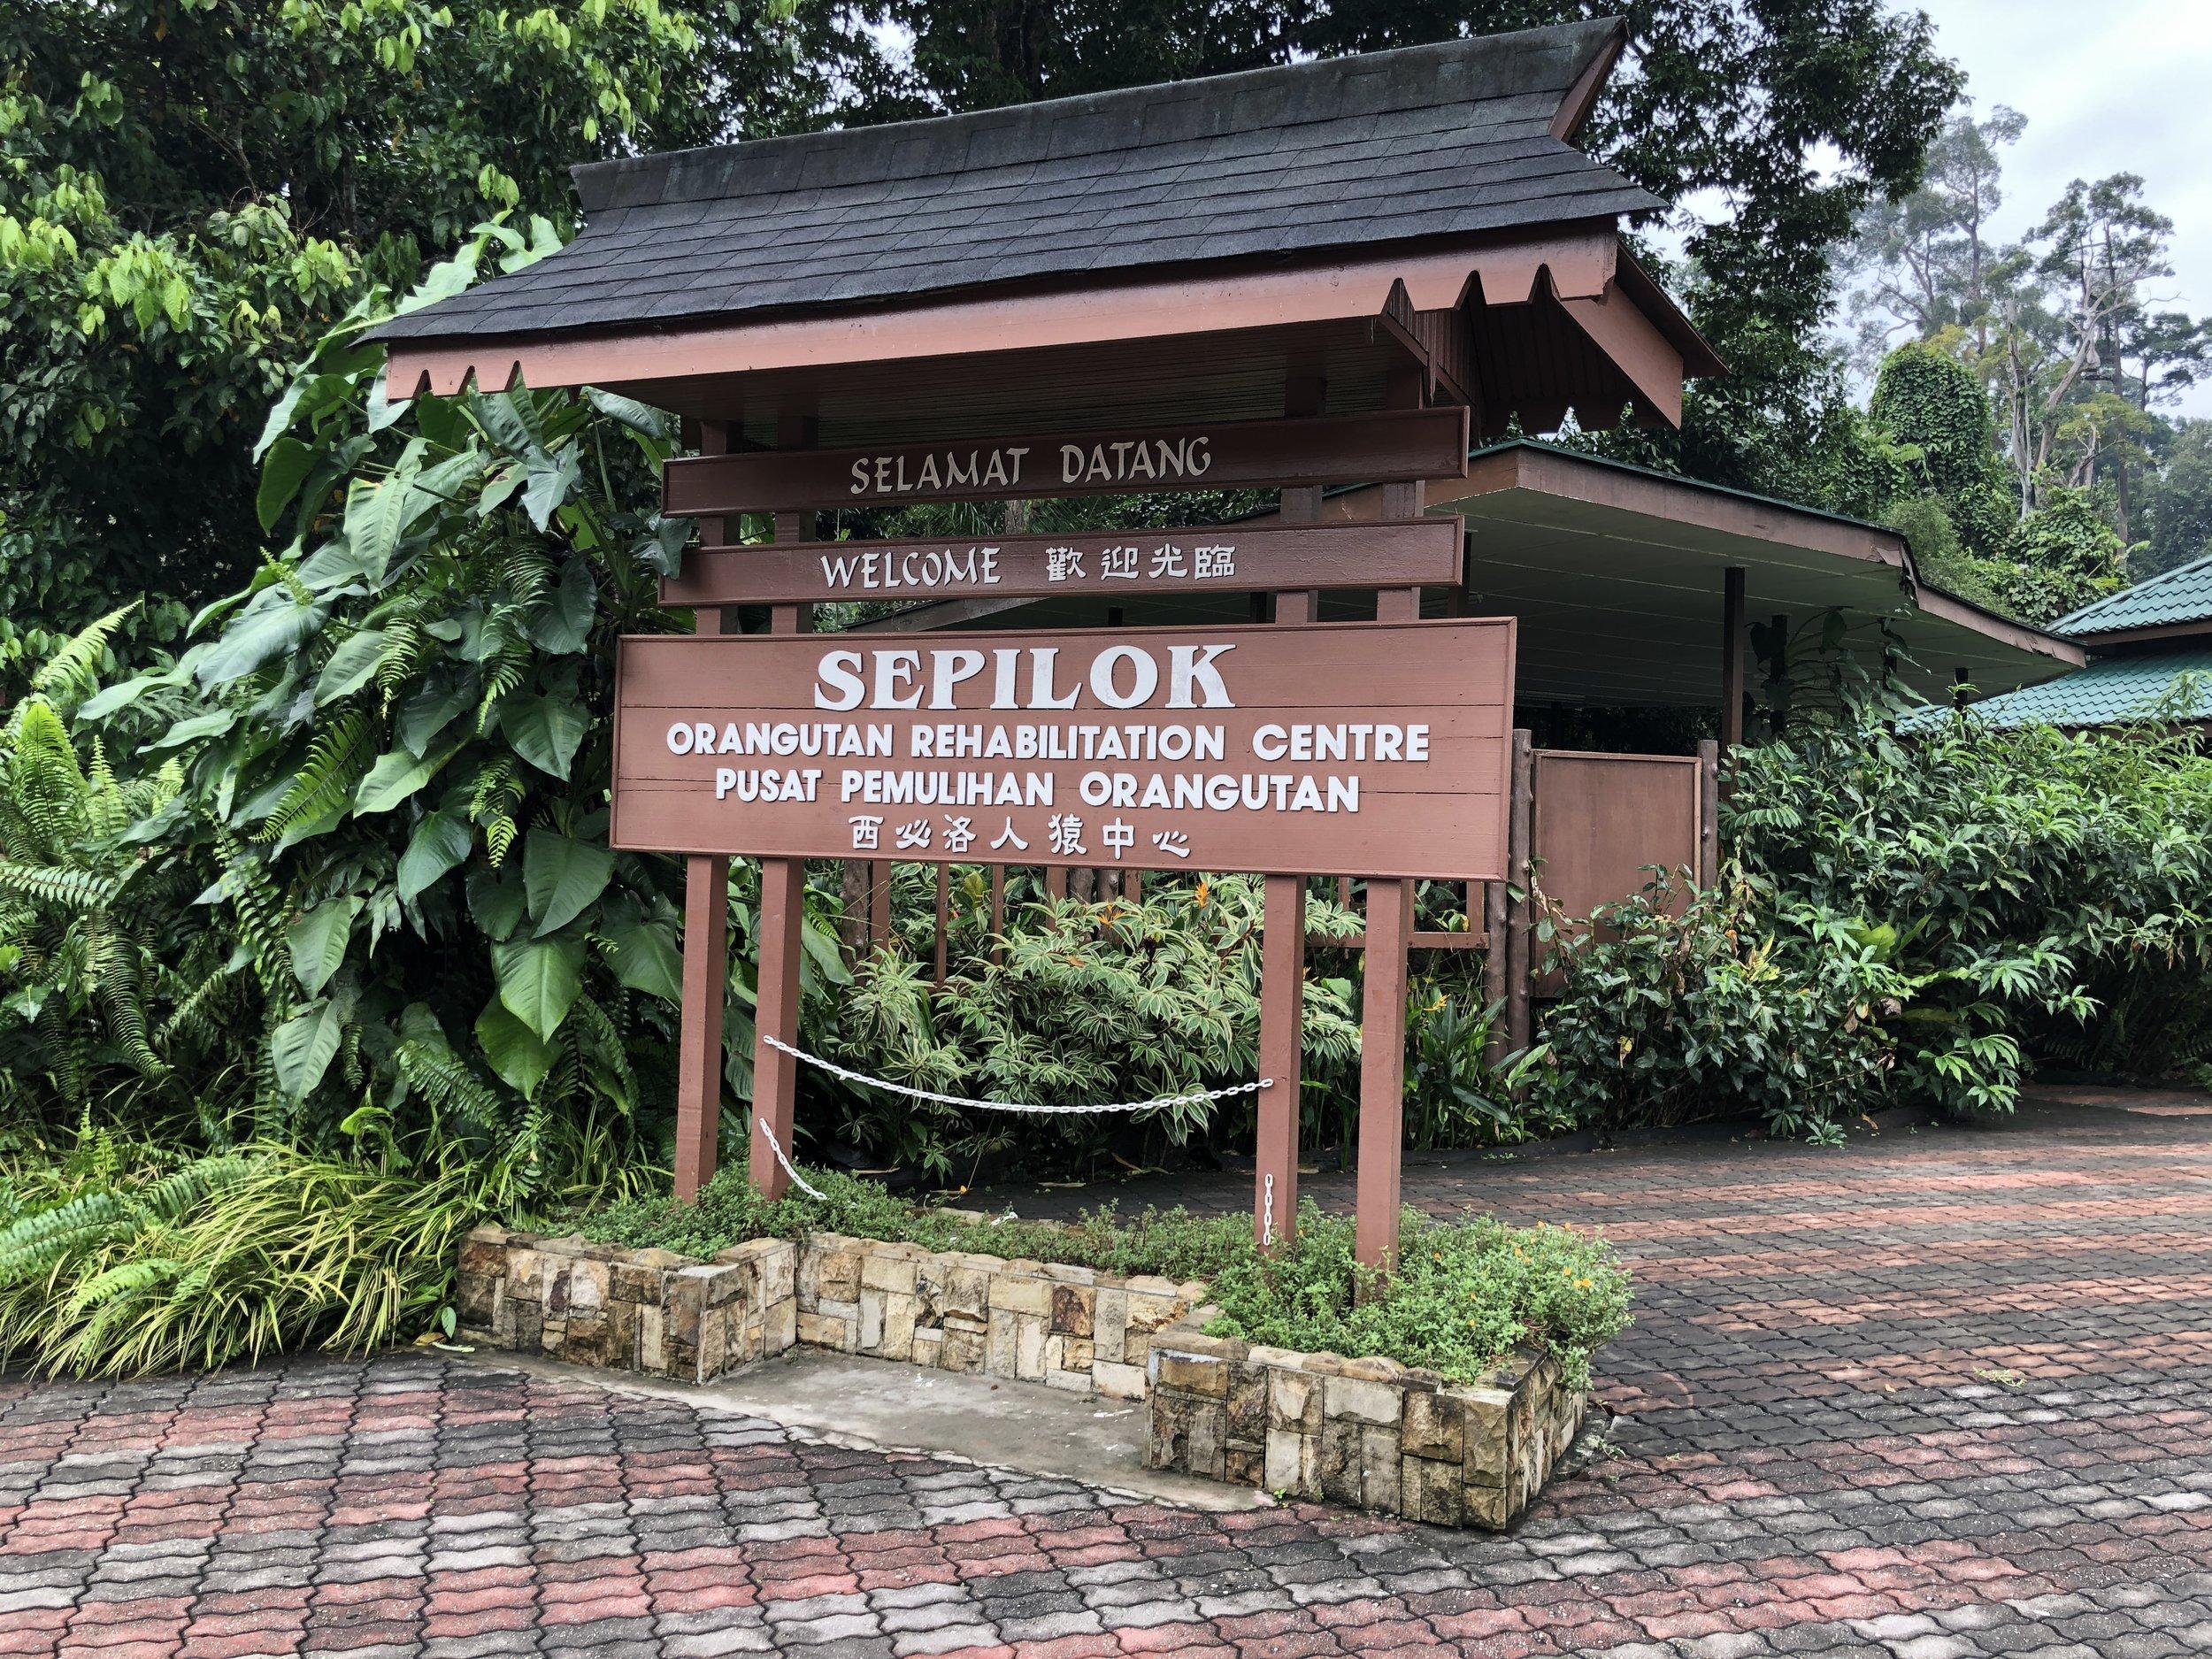 Visit the world-famous Sepilok Orangutan Rehabilitation Centre